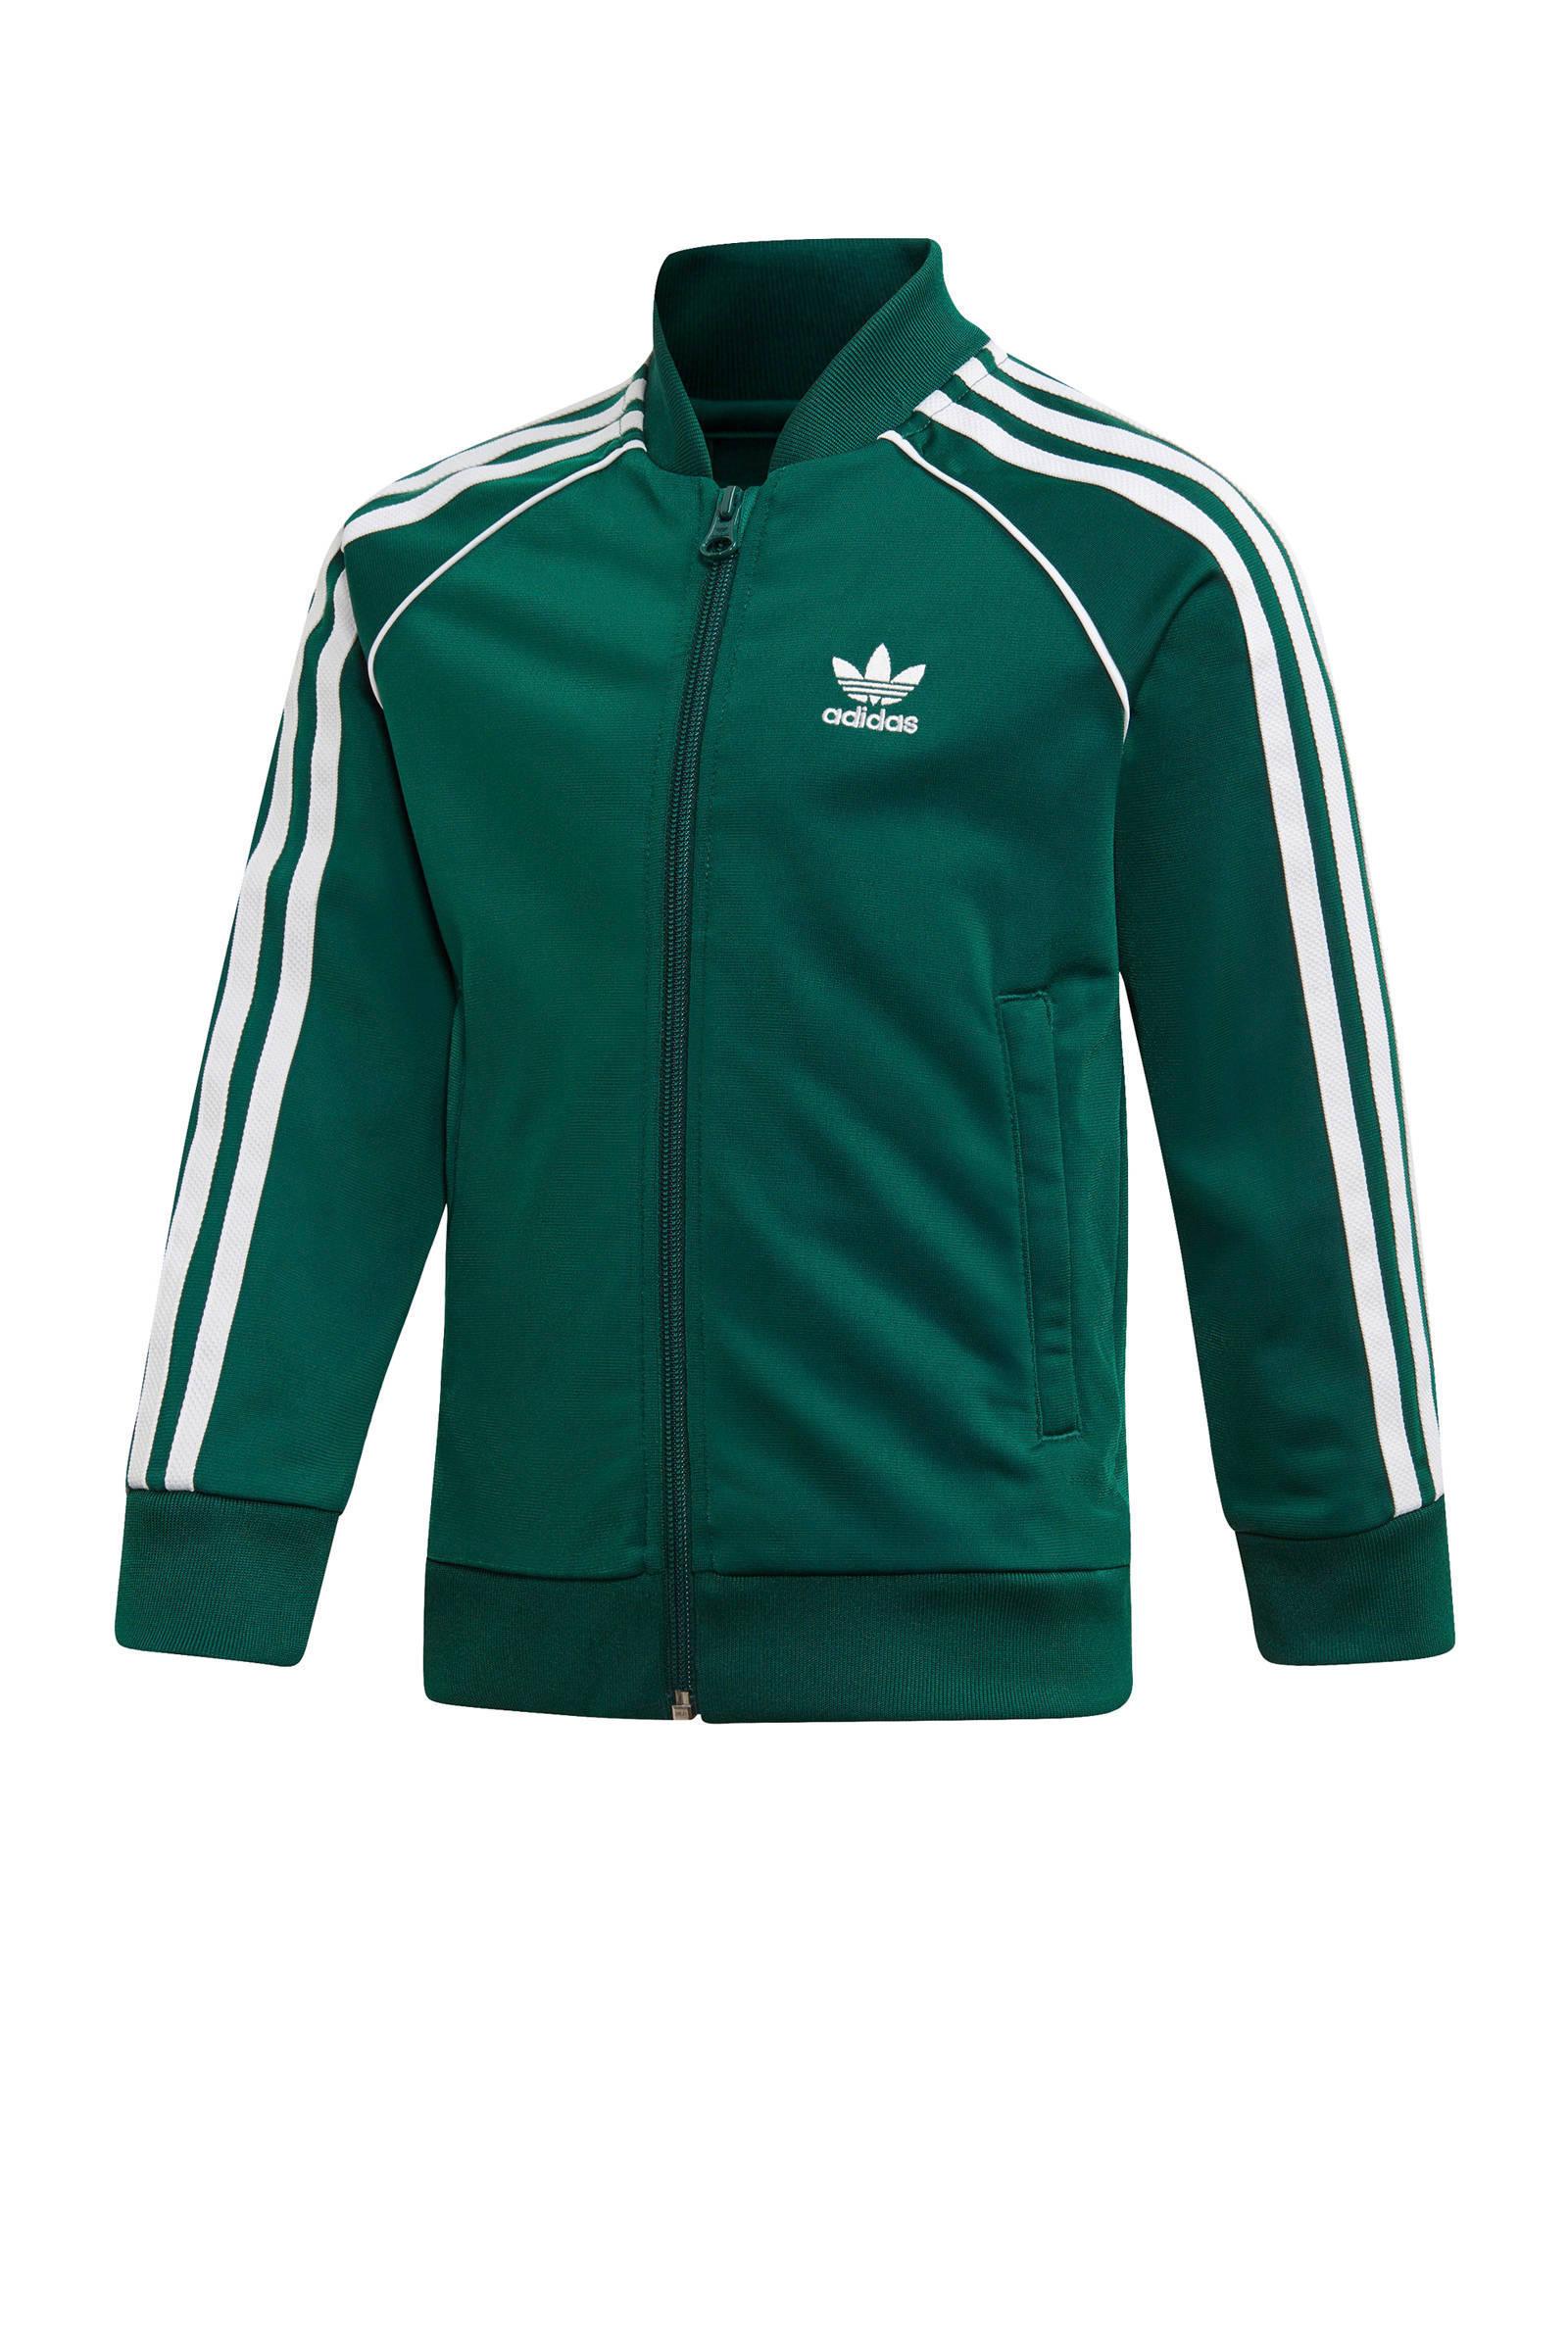 Adicolor trainingspak groen